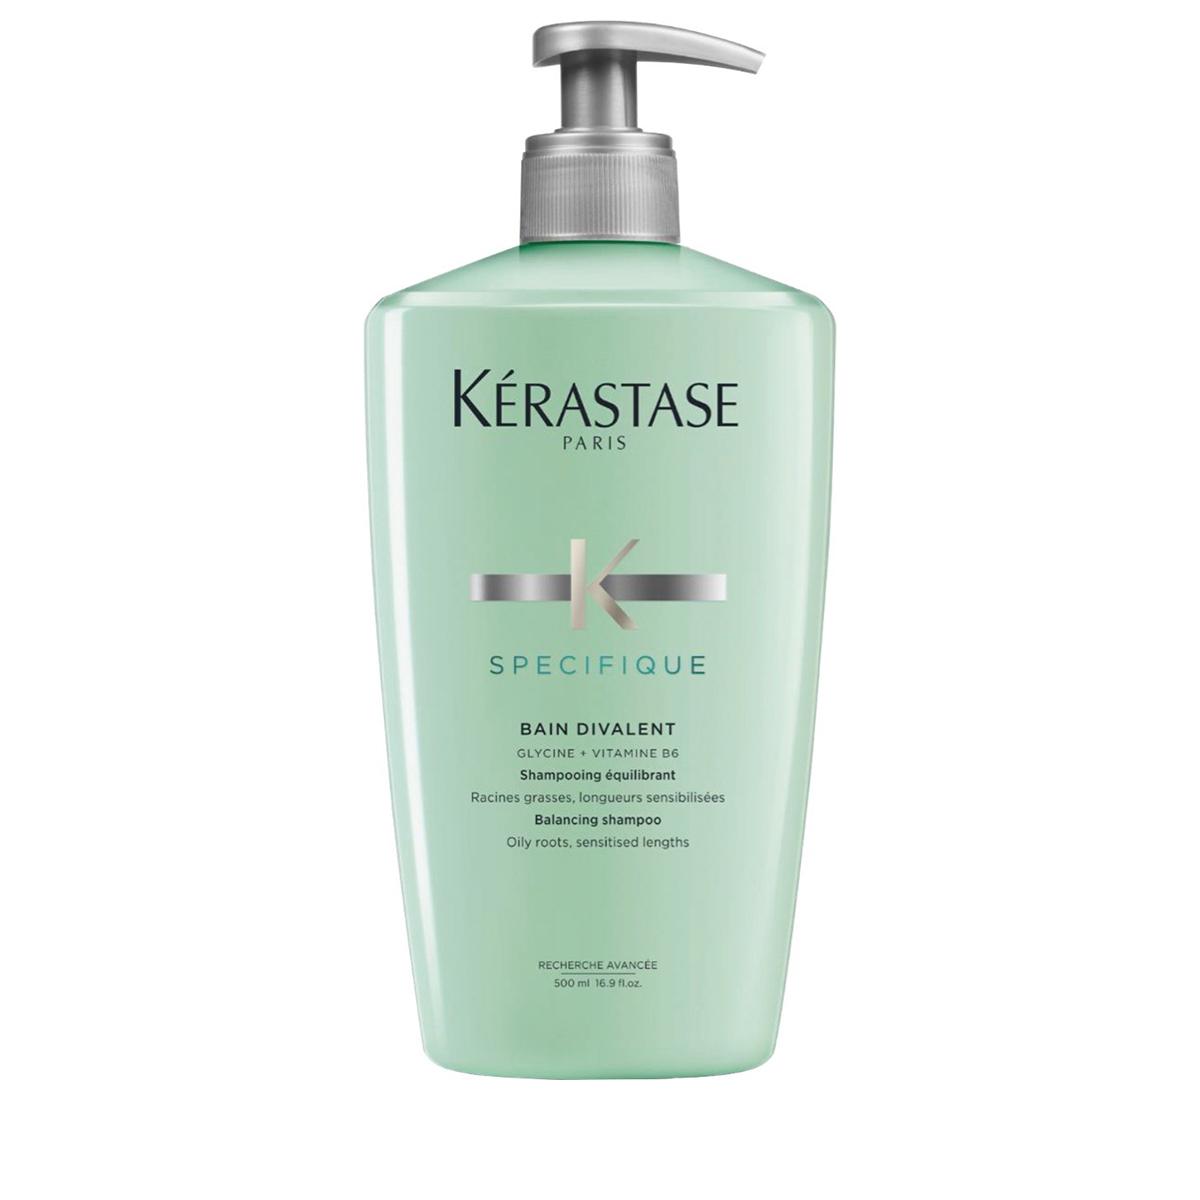 Kerastase Specifique Bain Divalent 500ml